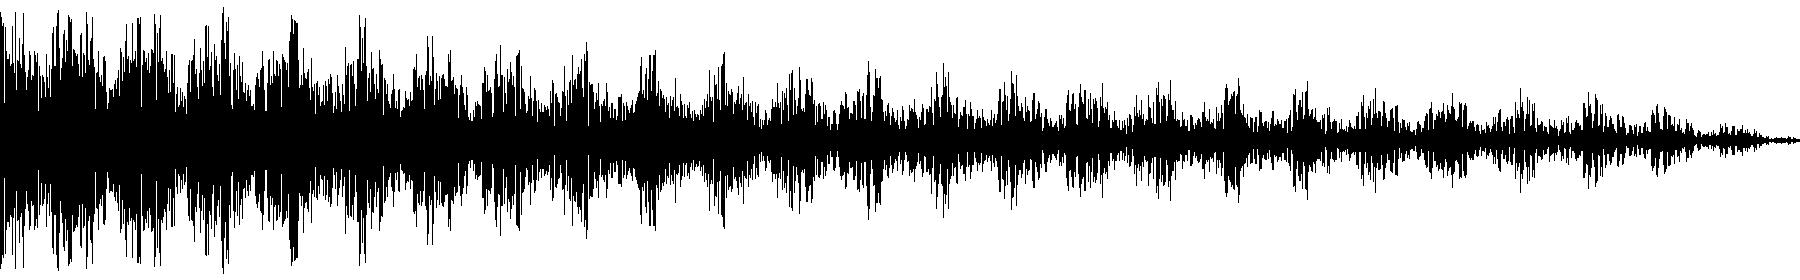 vedh synth cut 119 am9